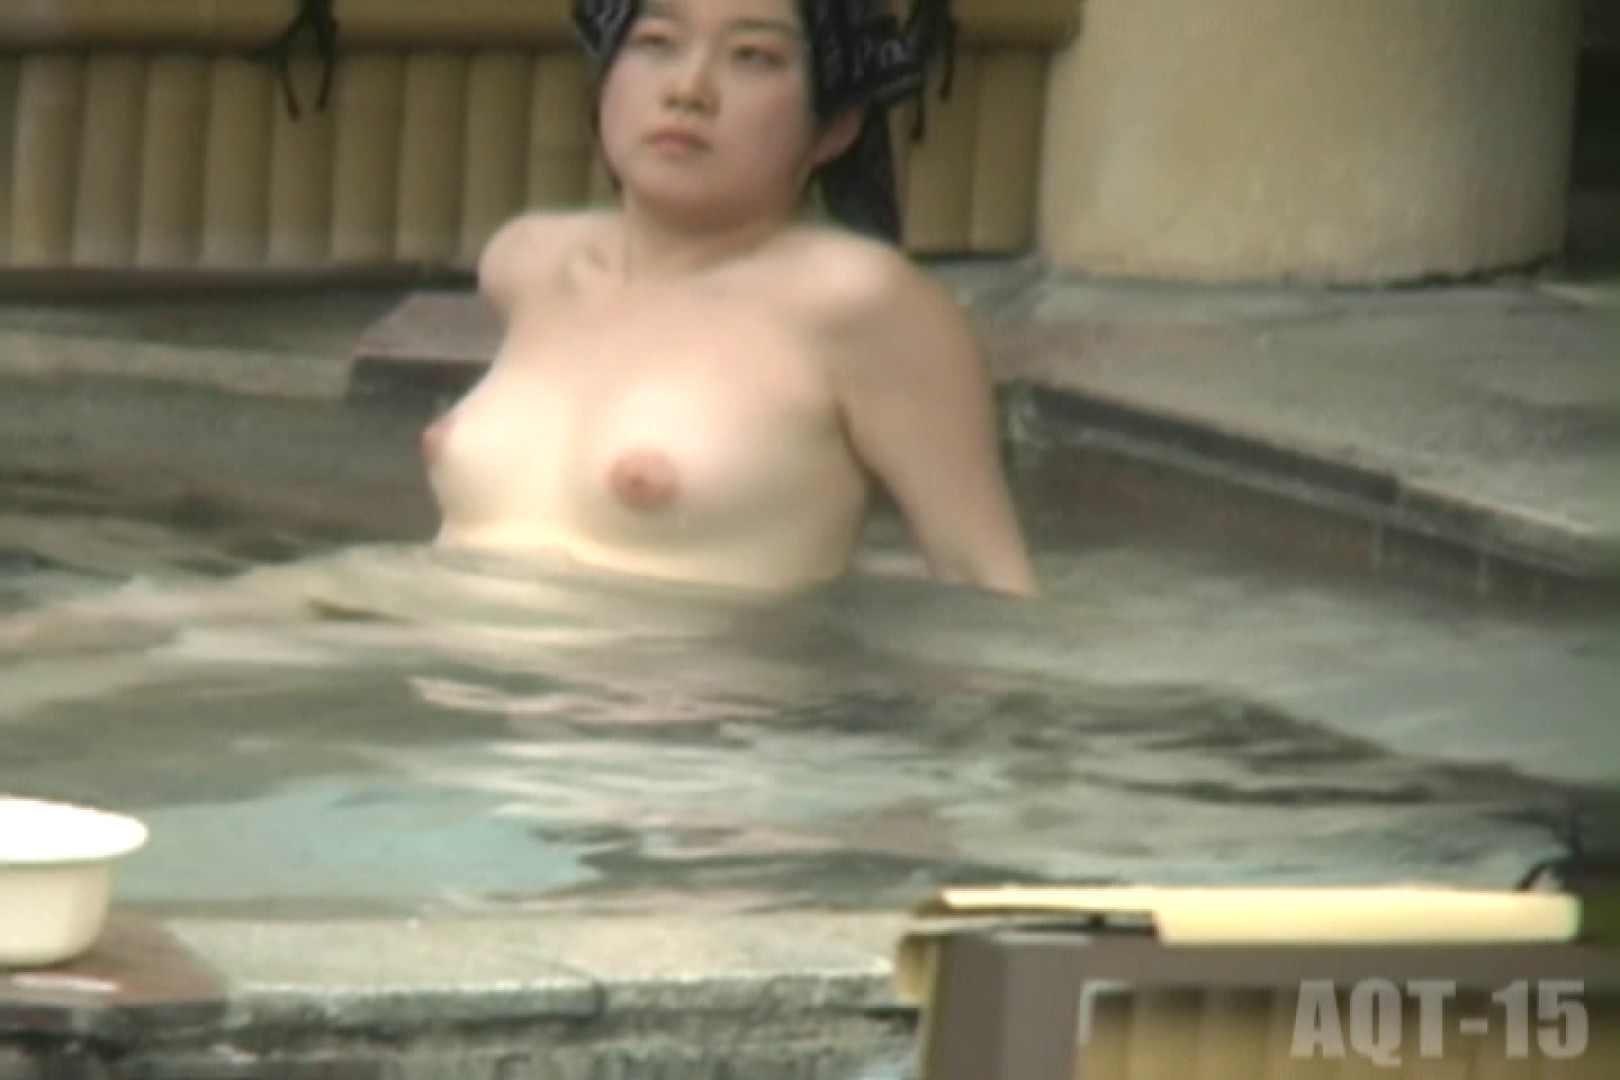 Aquaな露天風呂Vol.833 盗撮大放出 エロ無料画像 77連発 22